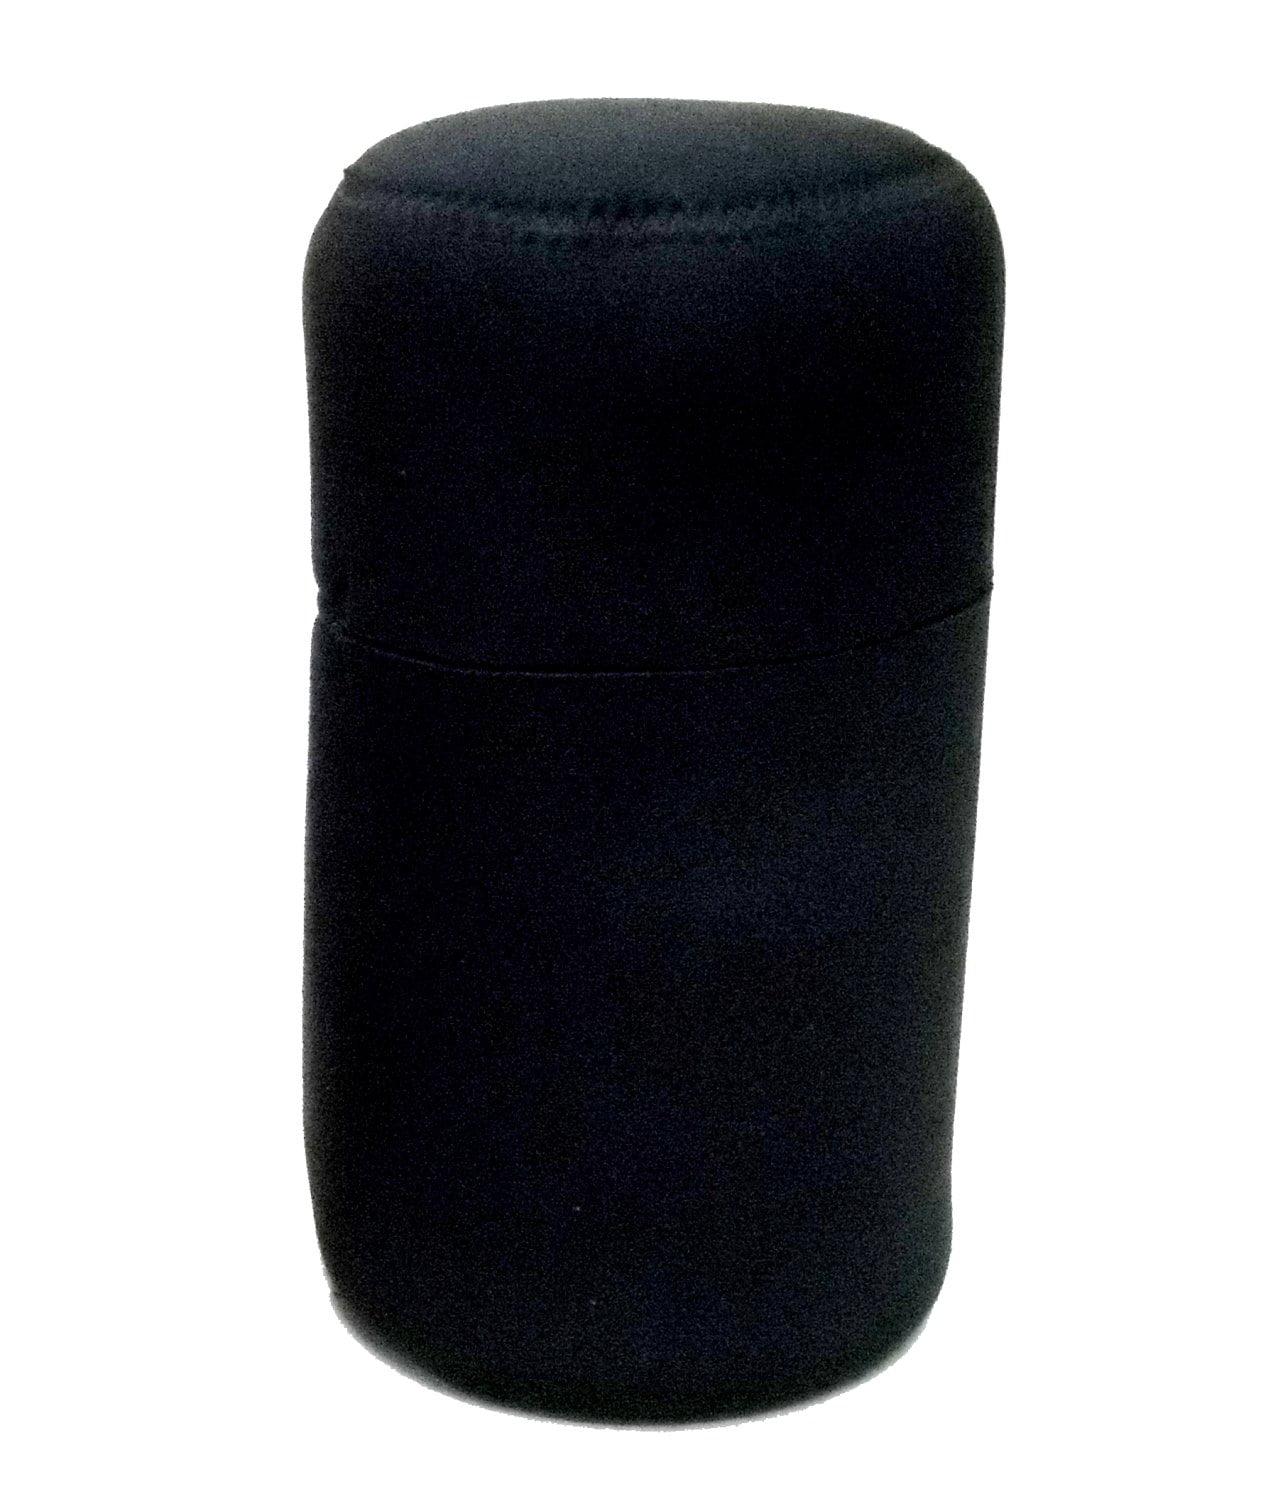 UCO Black Neoprene Candle Lantern Cocoon Case L-BAG-CO